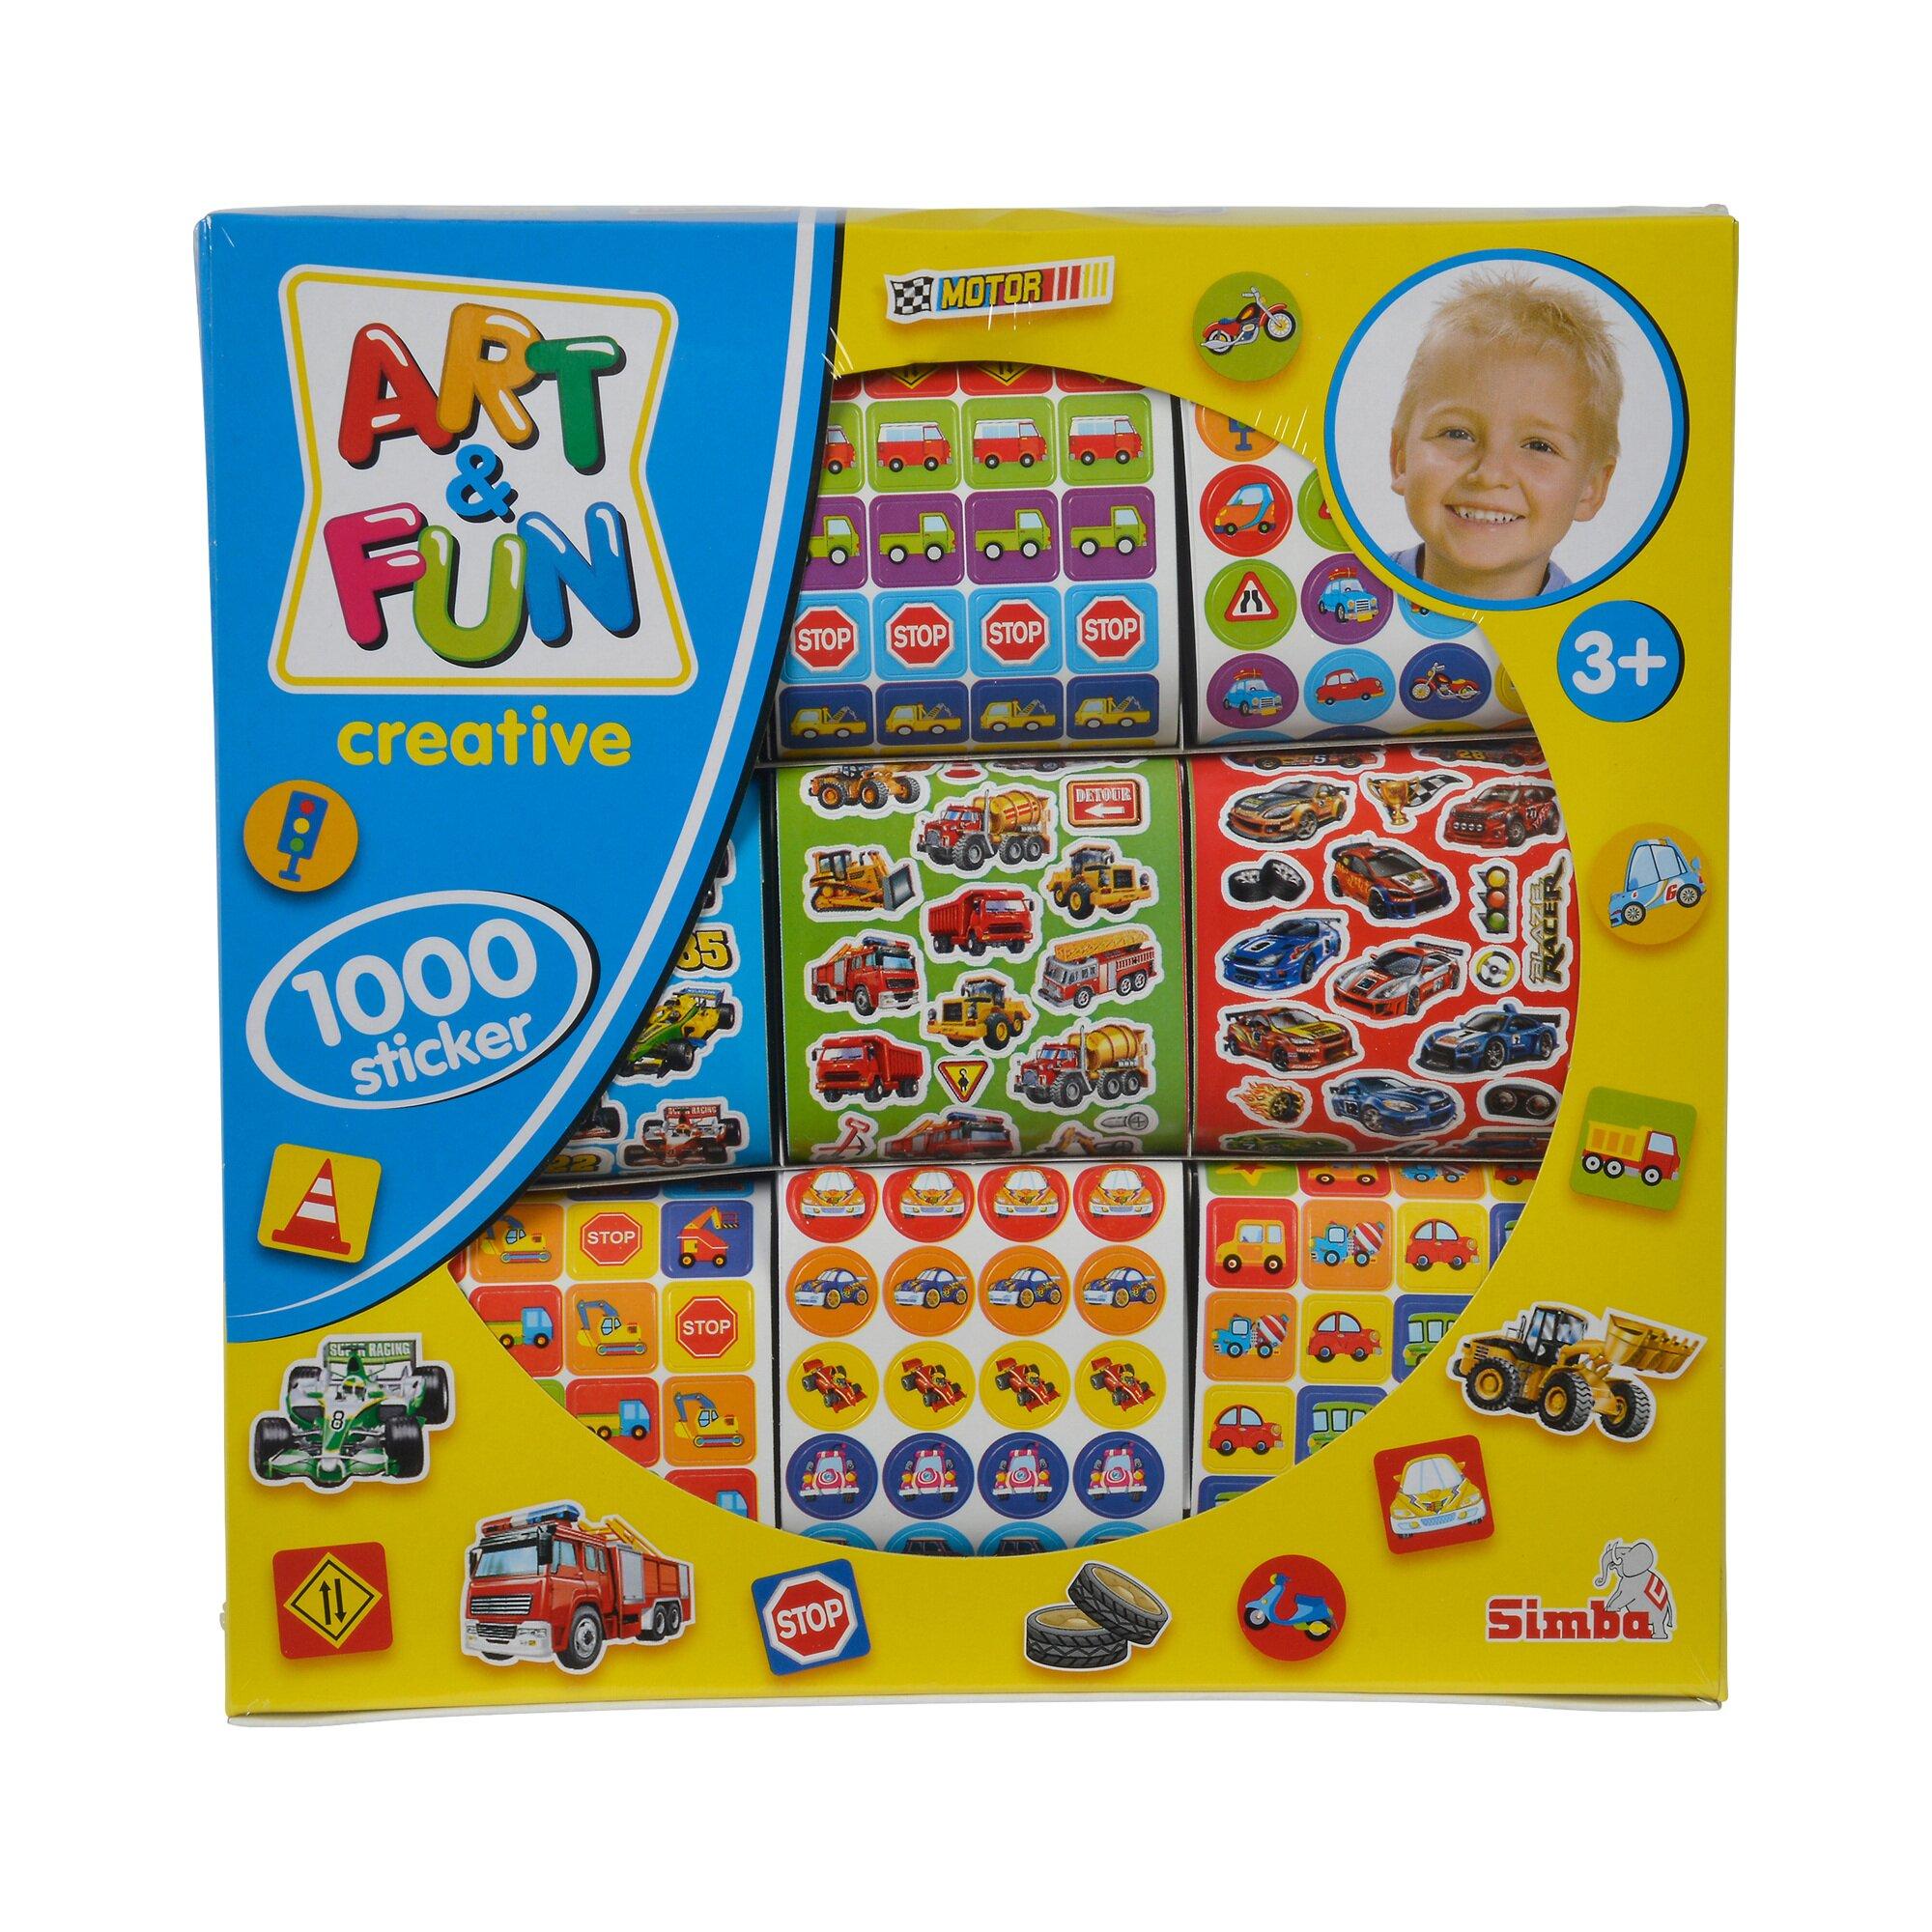 Simba Bastel-Set Sticker Art&Fun 1.000 Stück